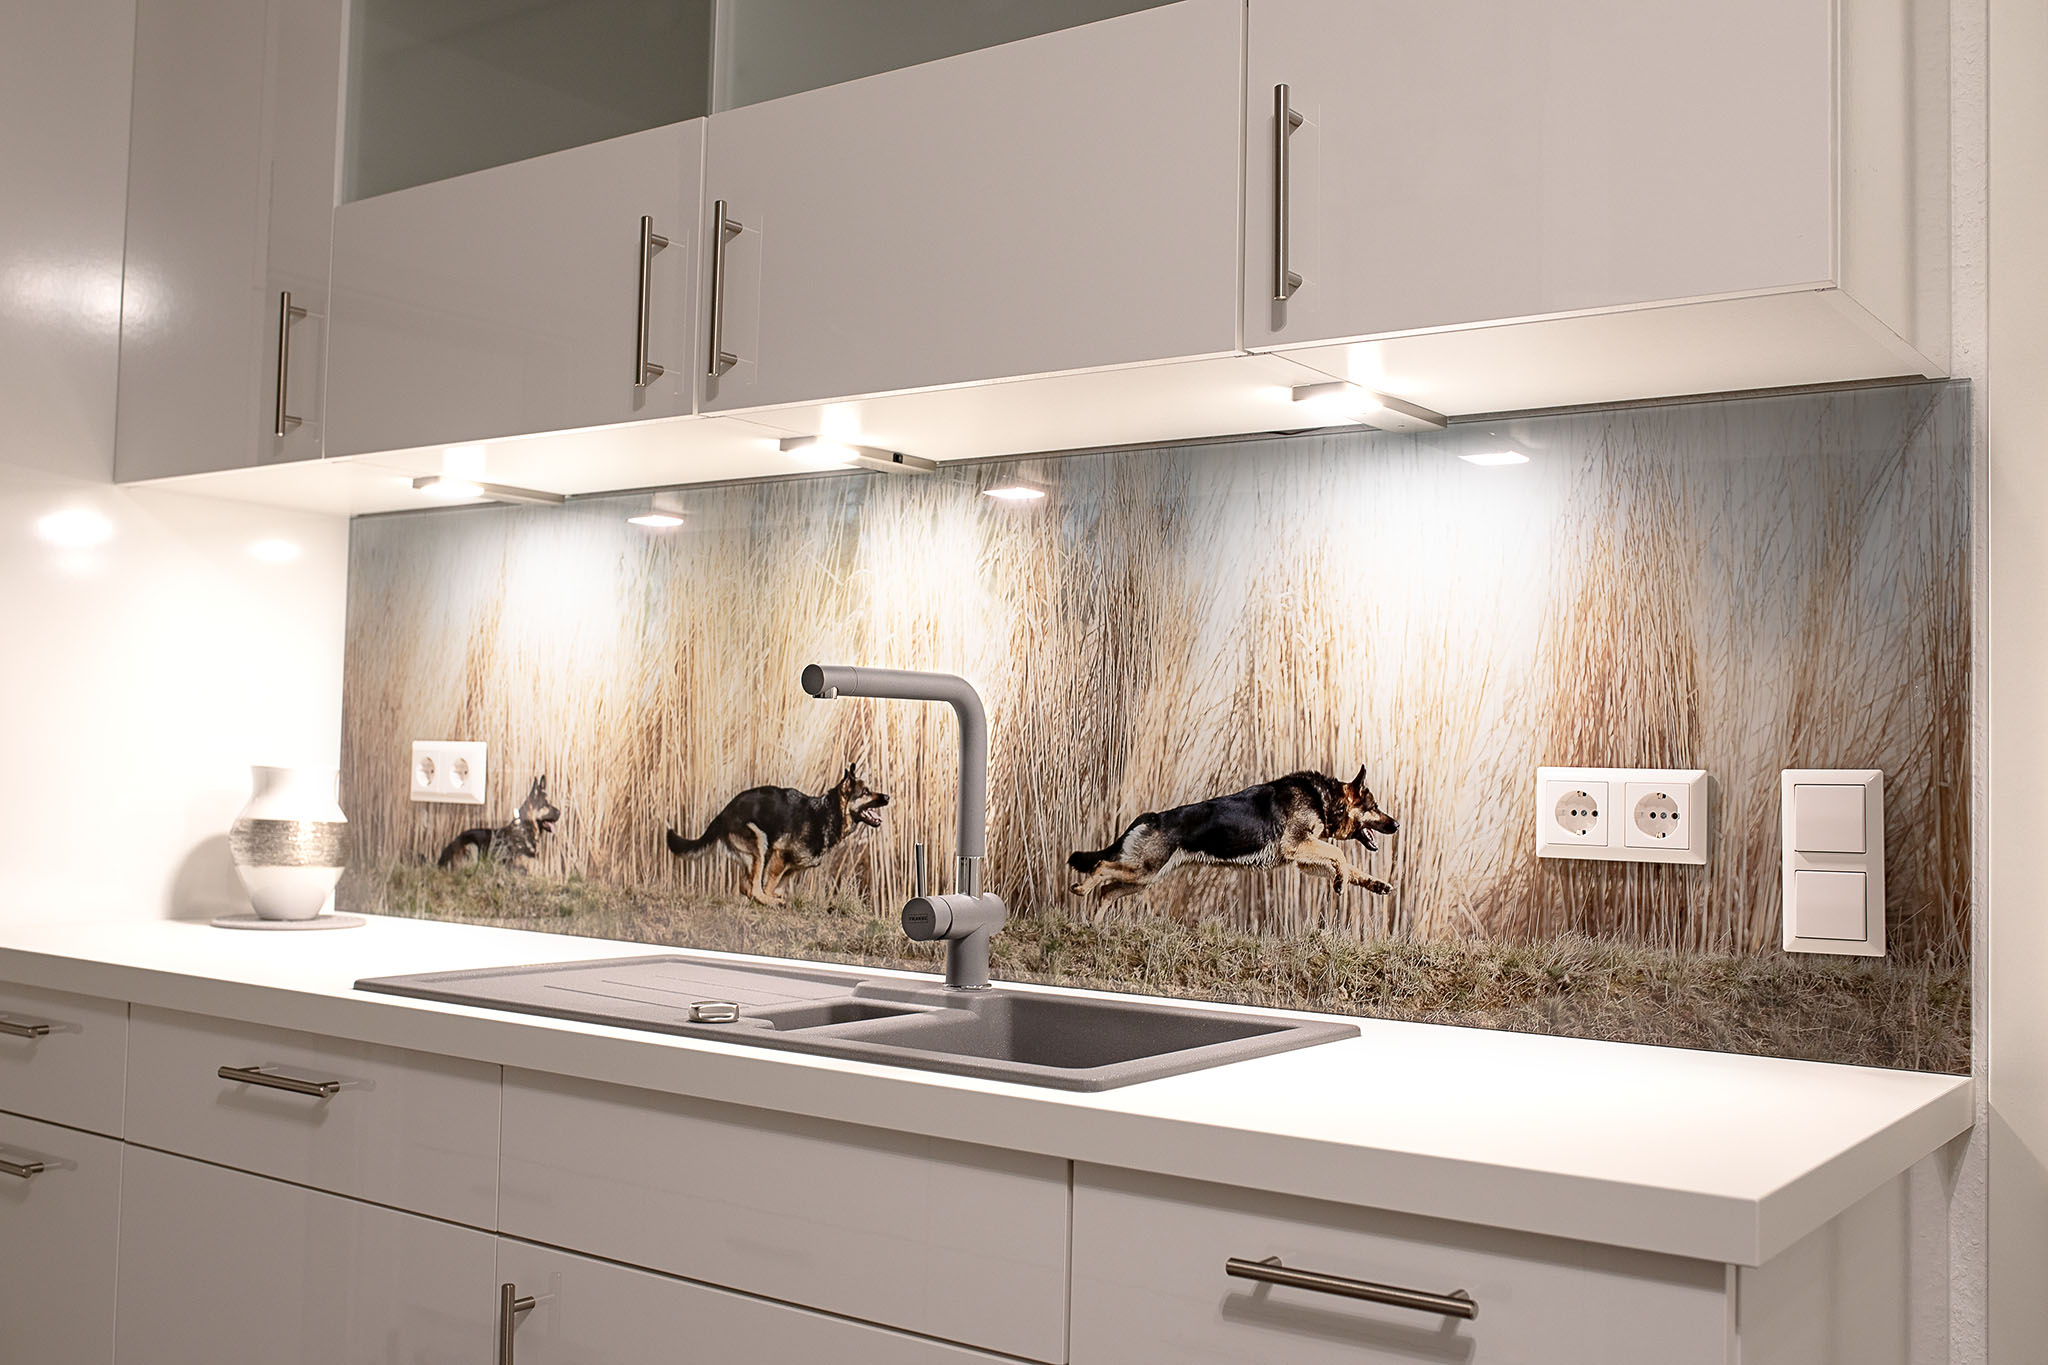 Glasplatte Küchenrückwand | Meinglaser At Alexander Jordan Rückwände ...